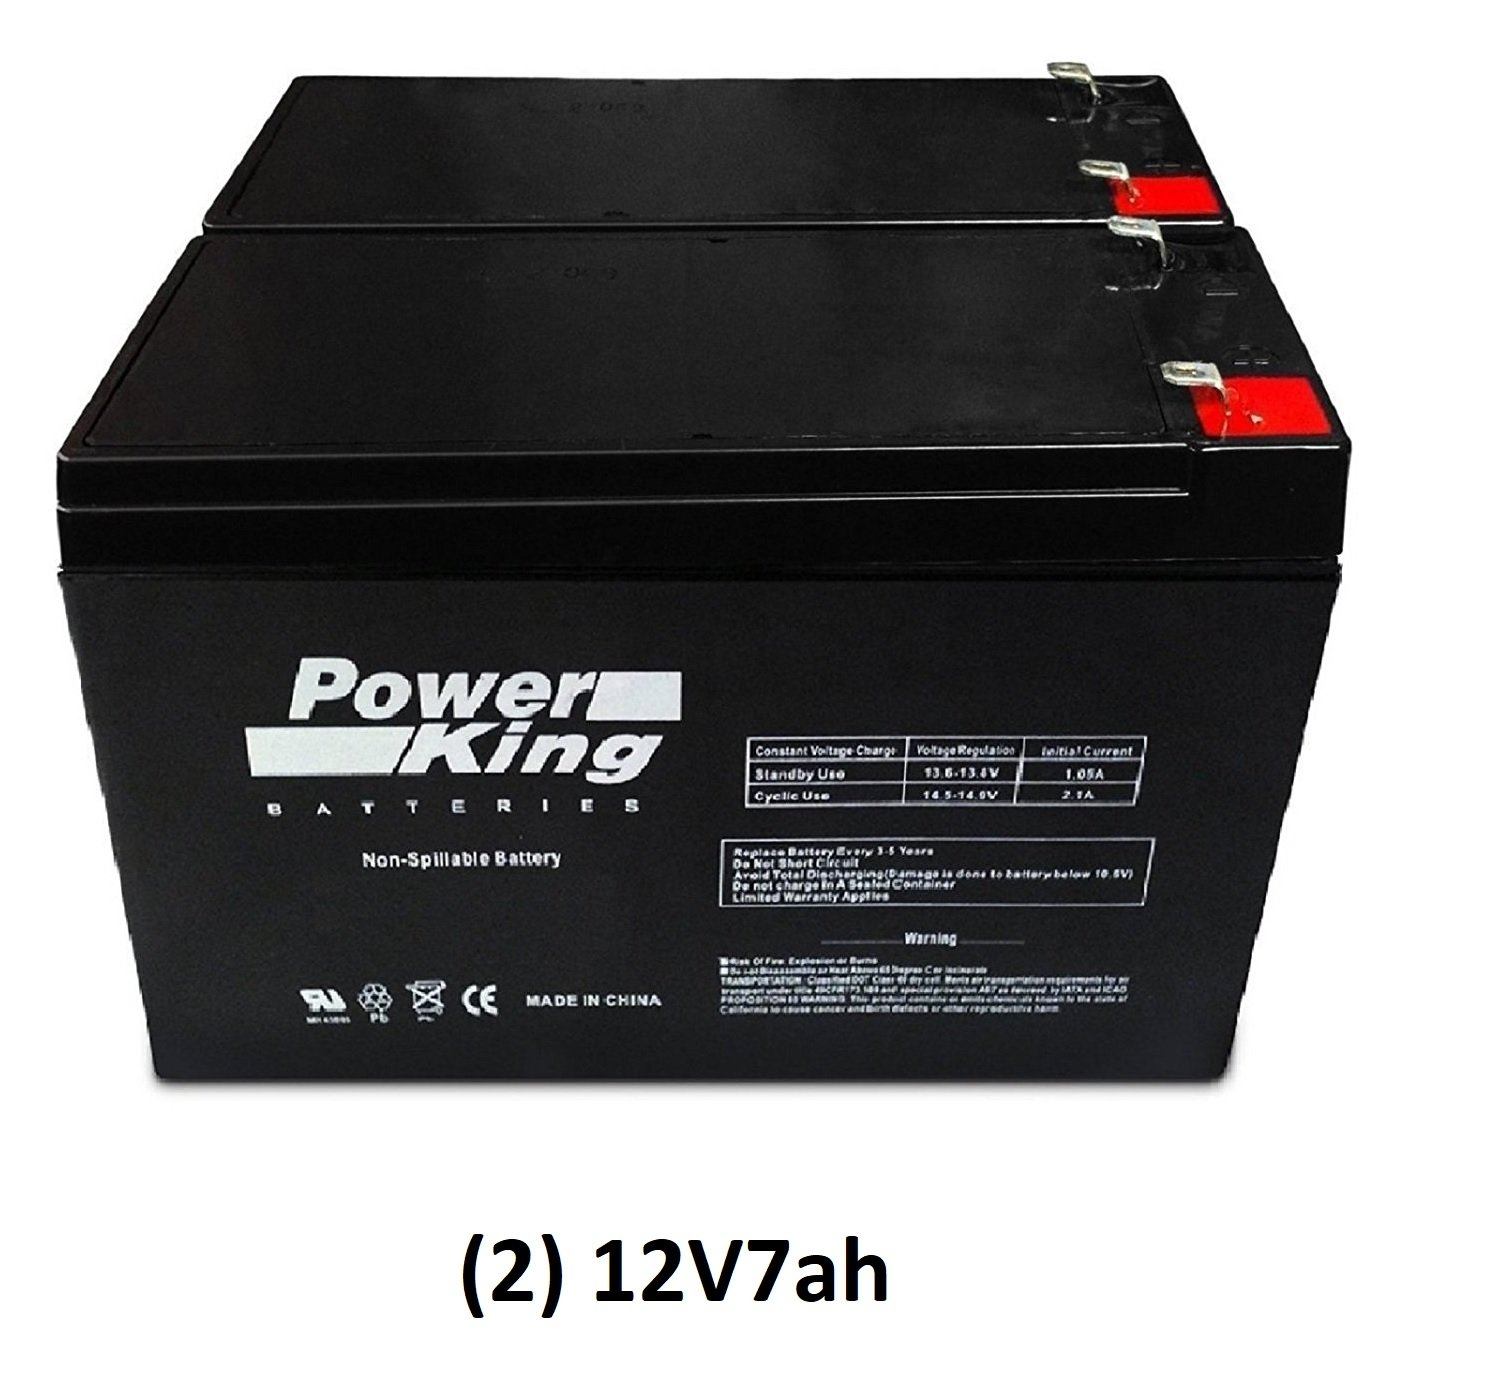 WRG-8579] Apc Wiring Harness